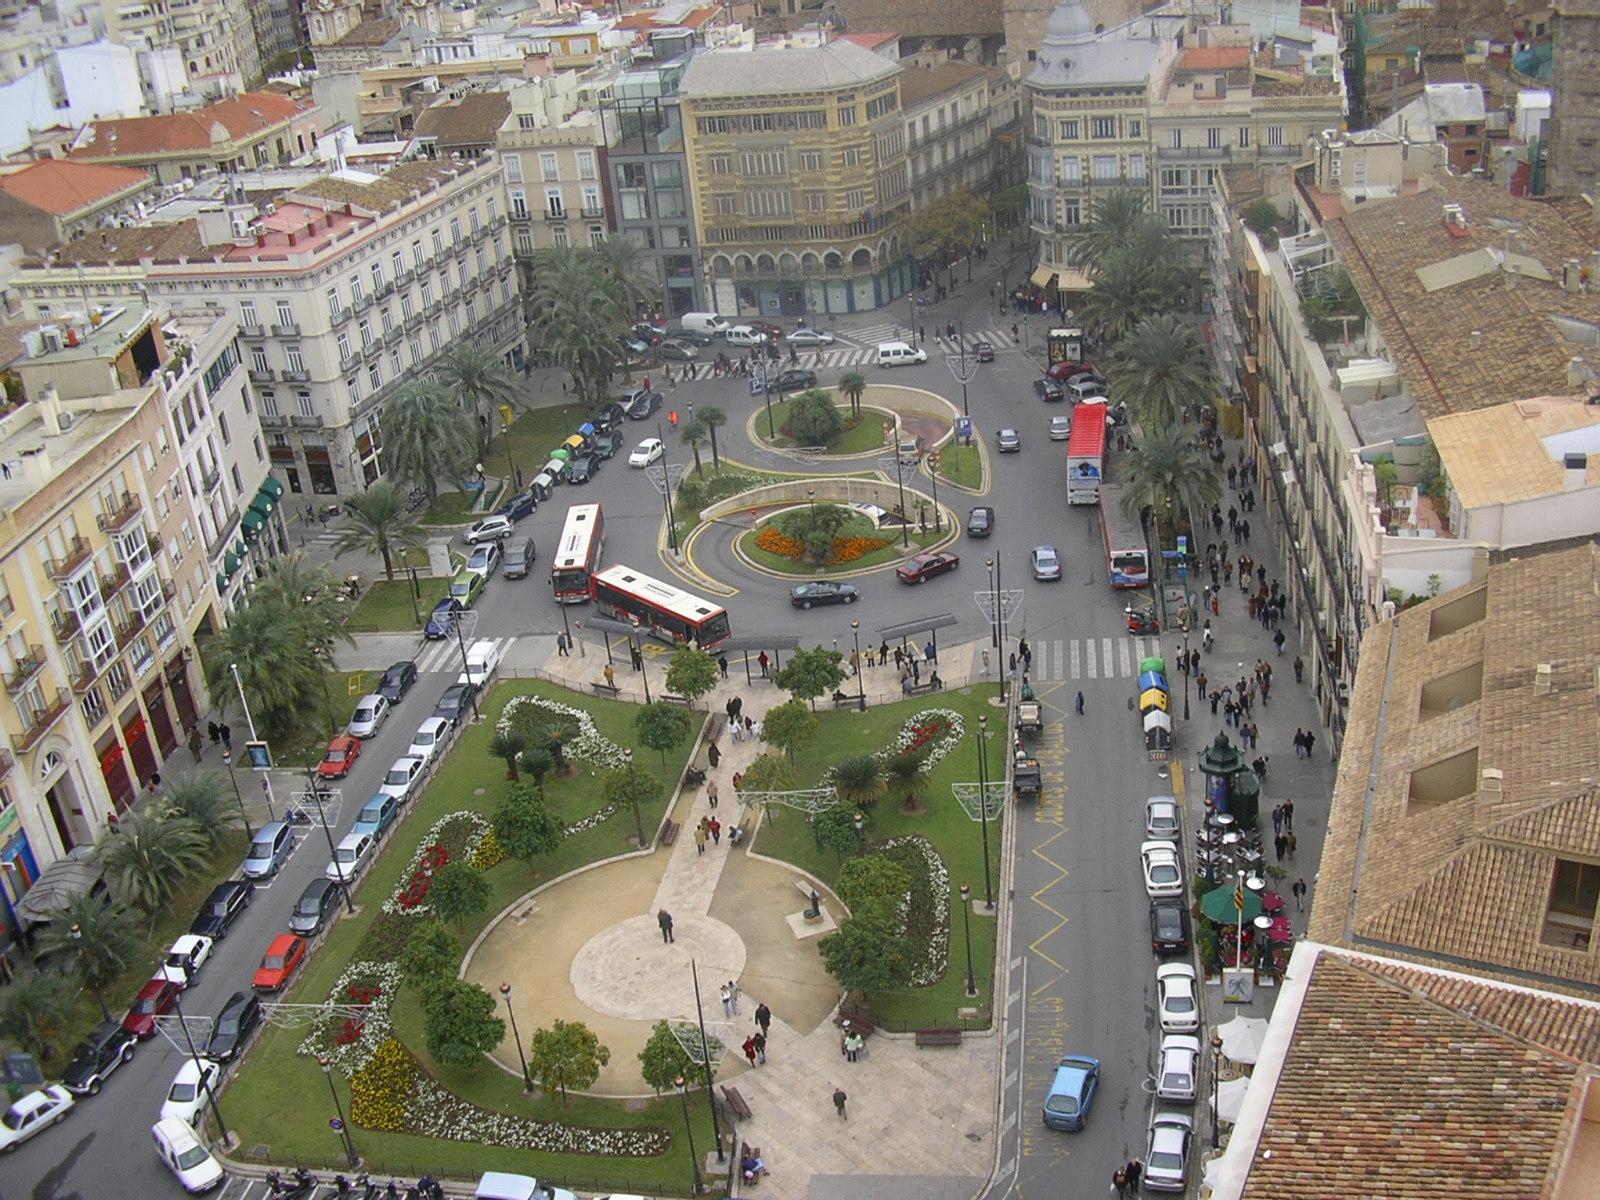 PLAZAS DEL MUNDO - Página 3 Pla%C3%A7a_de_la_reina,_Val%C3%A8ncia,_Valencian_Country